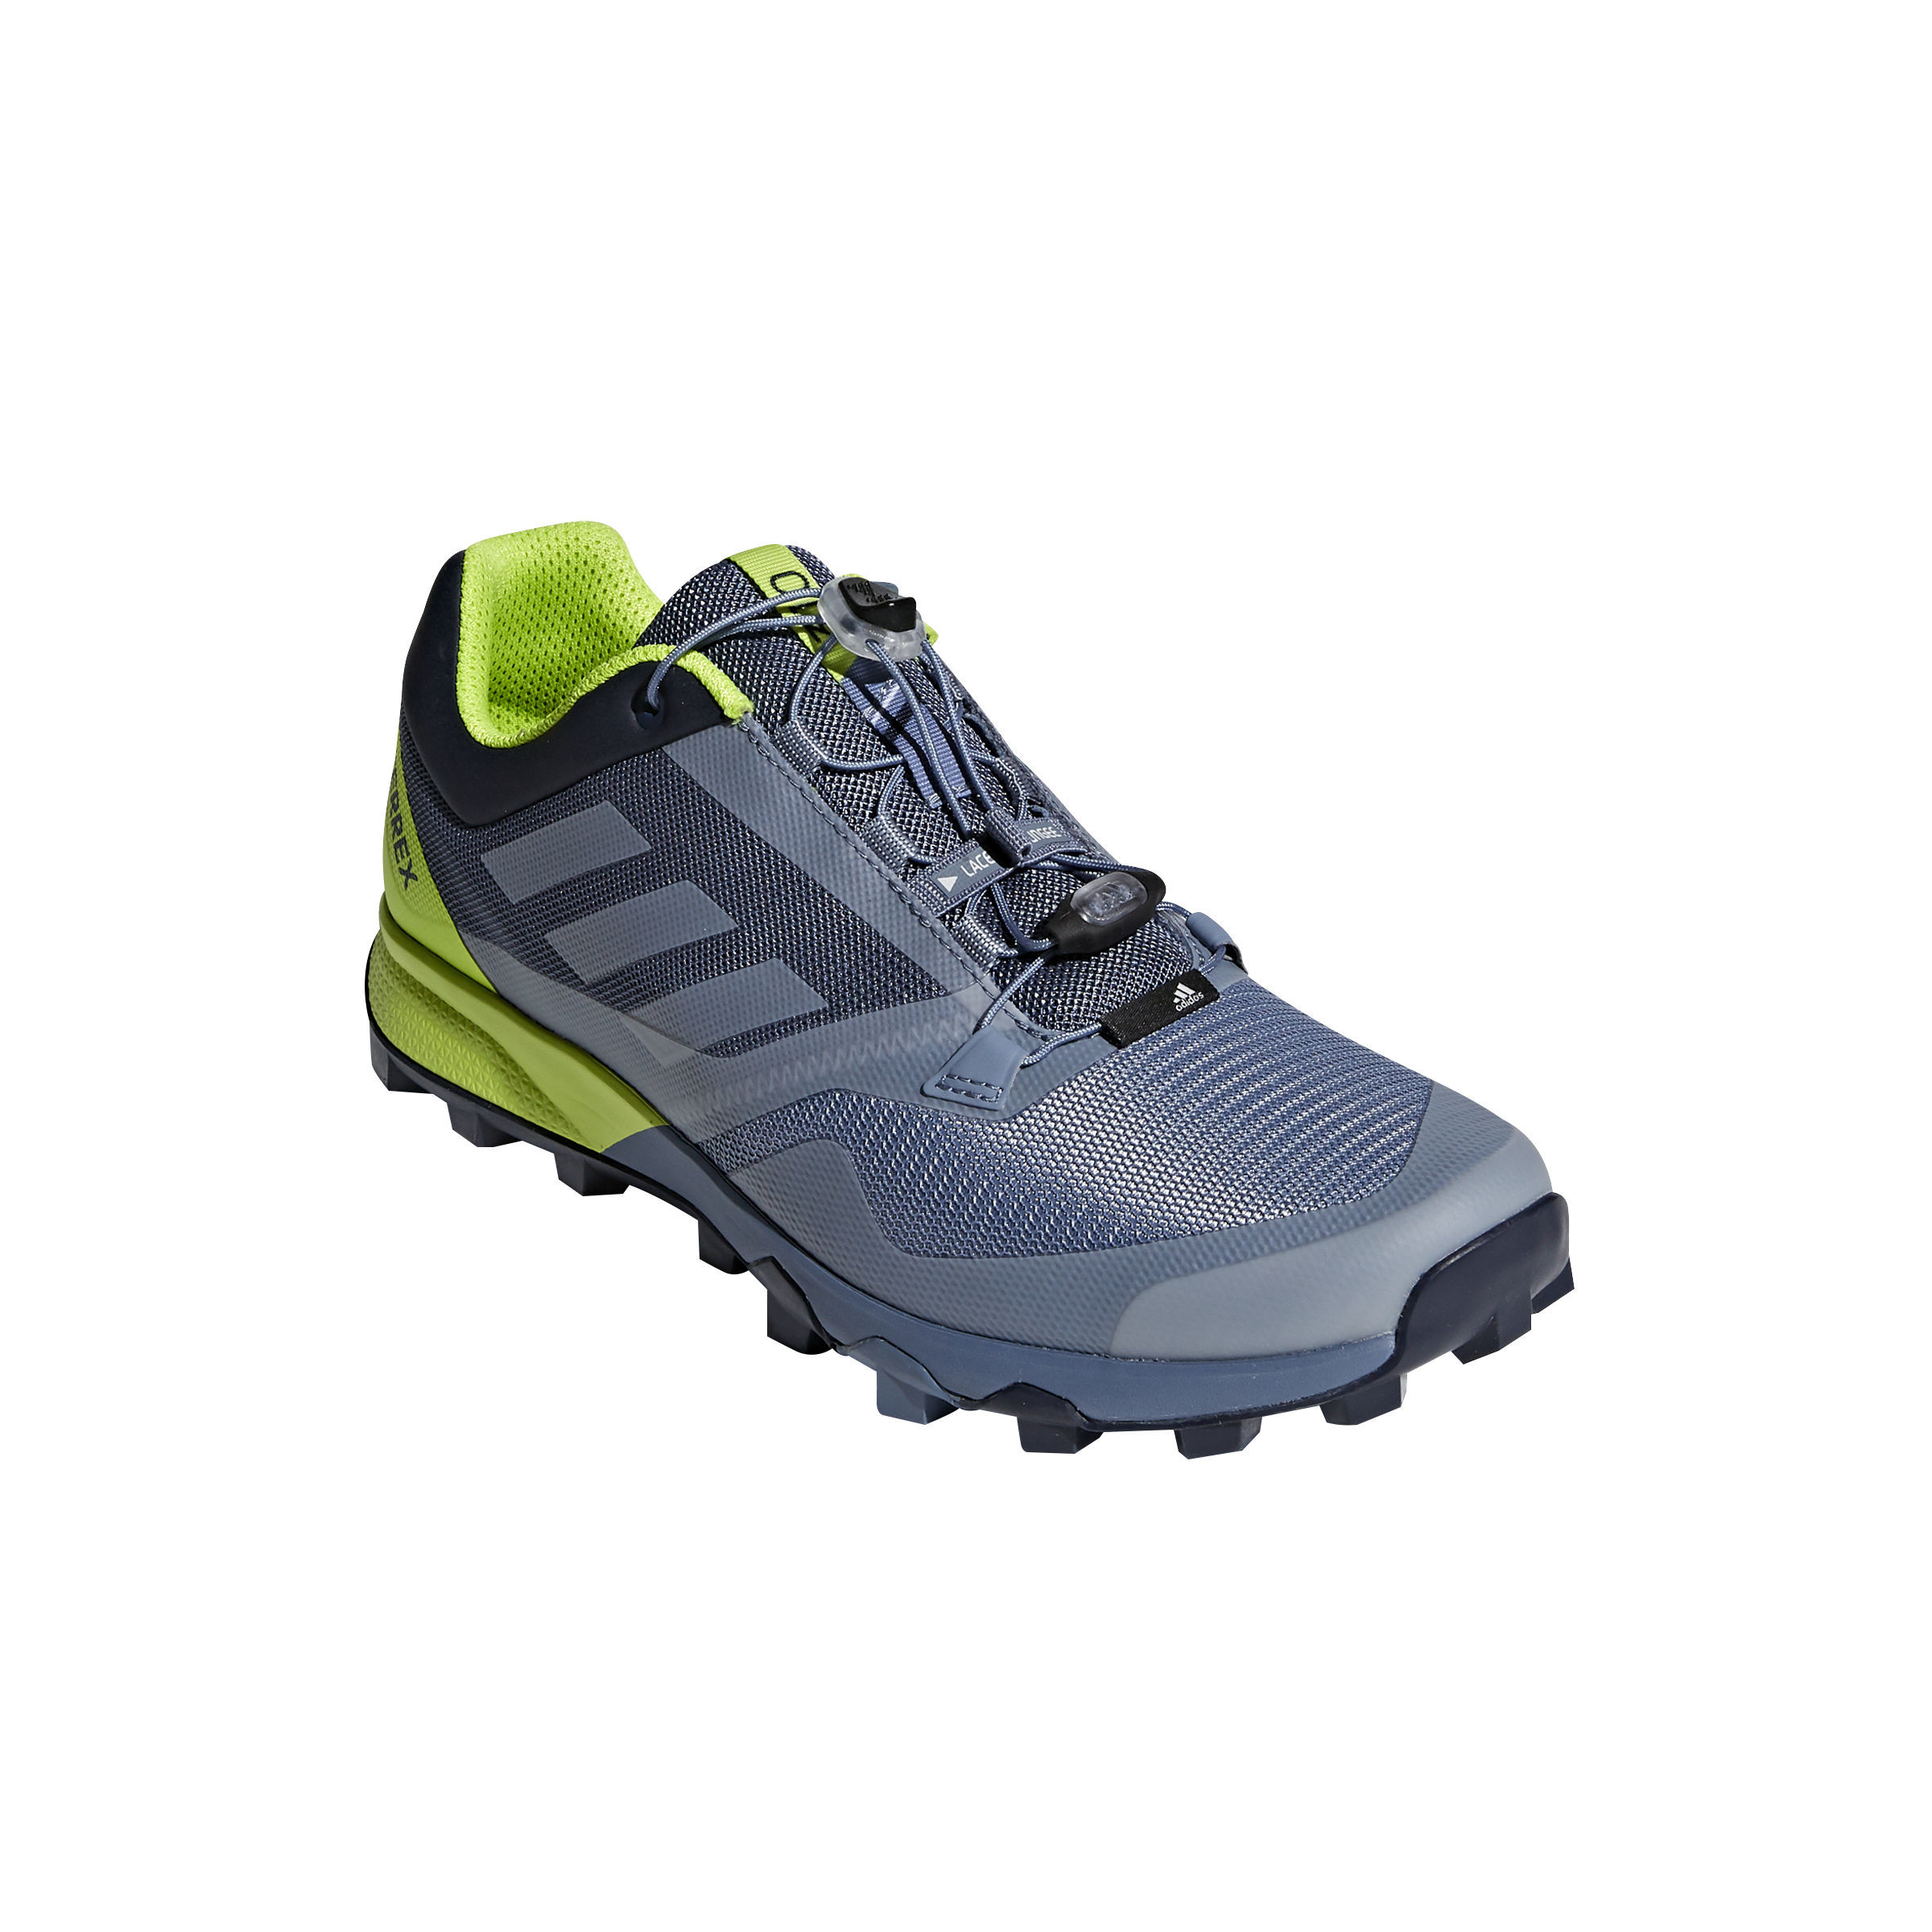 Adidas Outdoor Terrex Trailmaker Trail Running Shoe - Men s CM7627-12.5 w   Free S H f678032d1